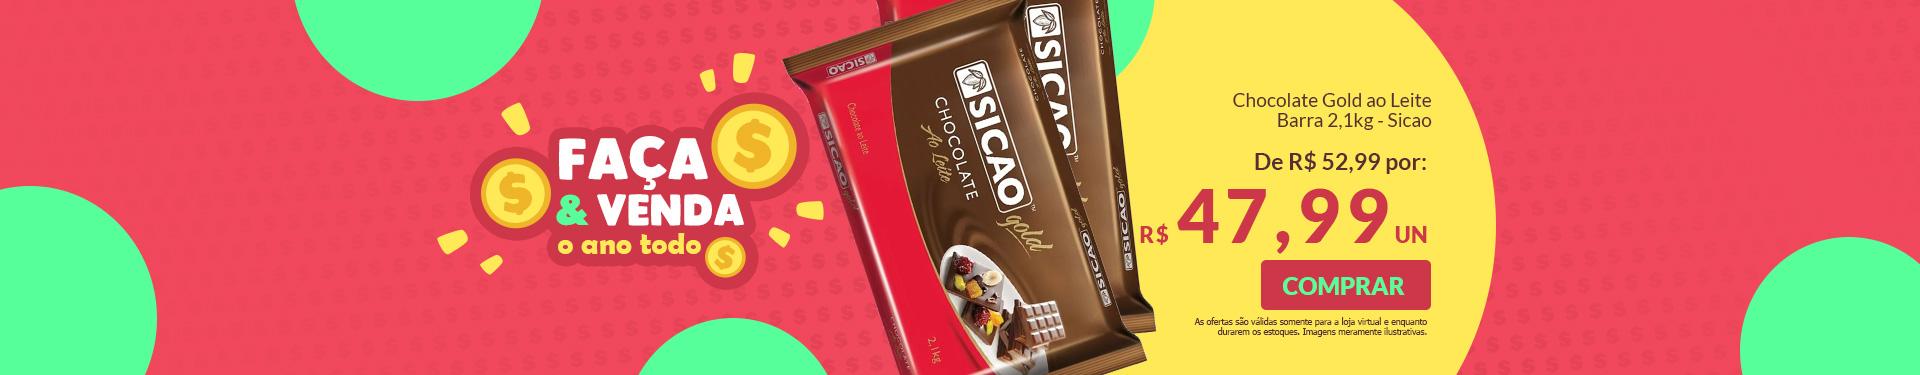 -chocolate gold ao leite